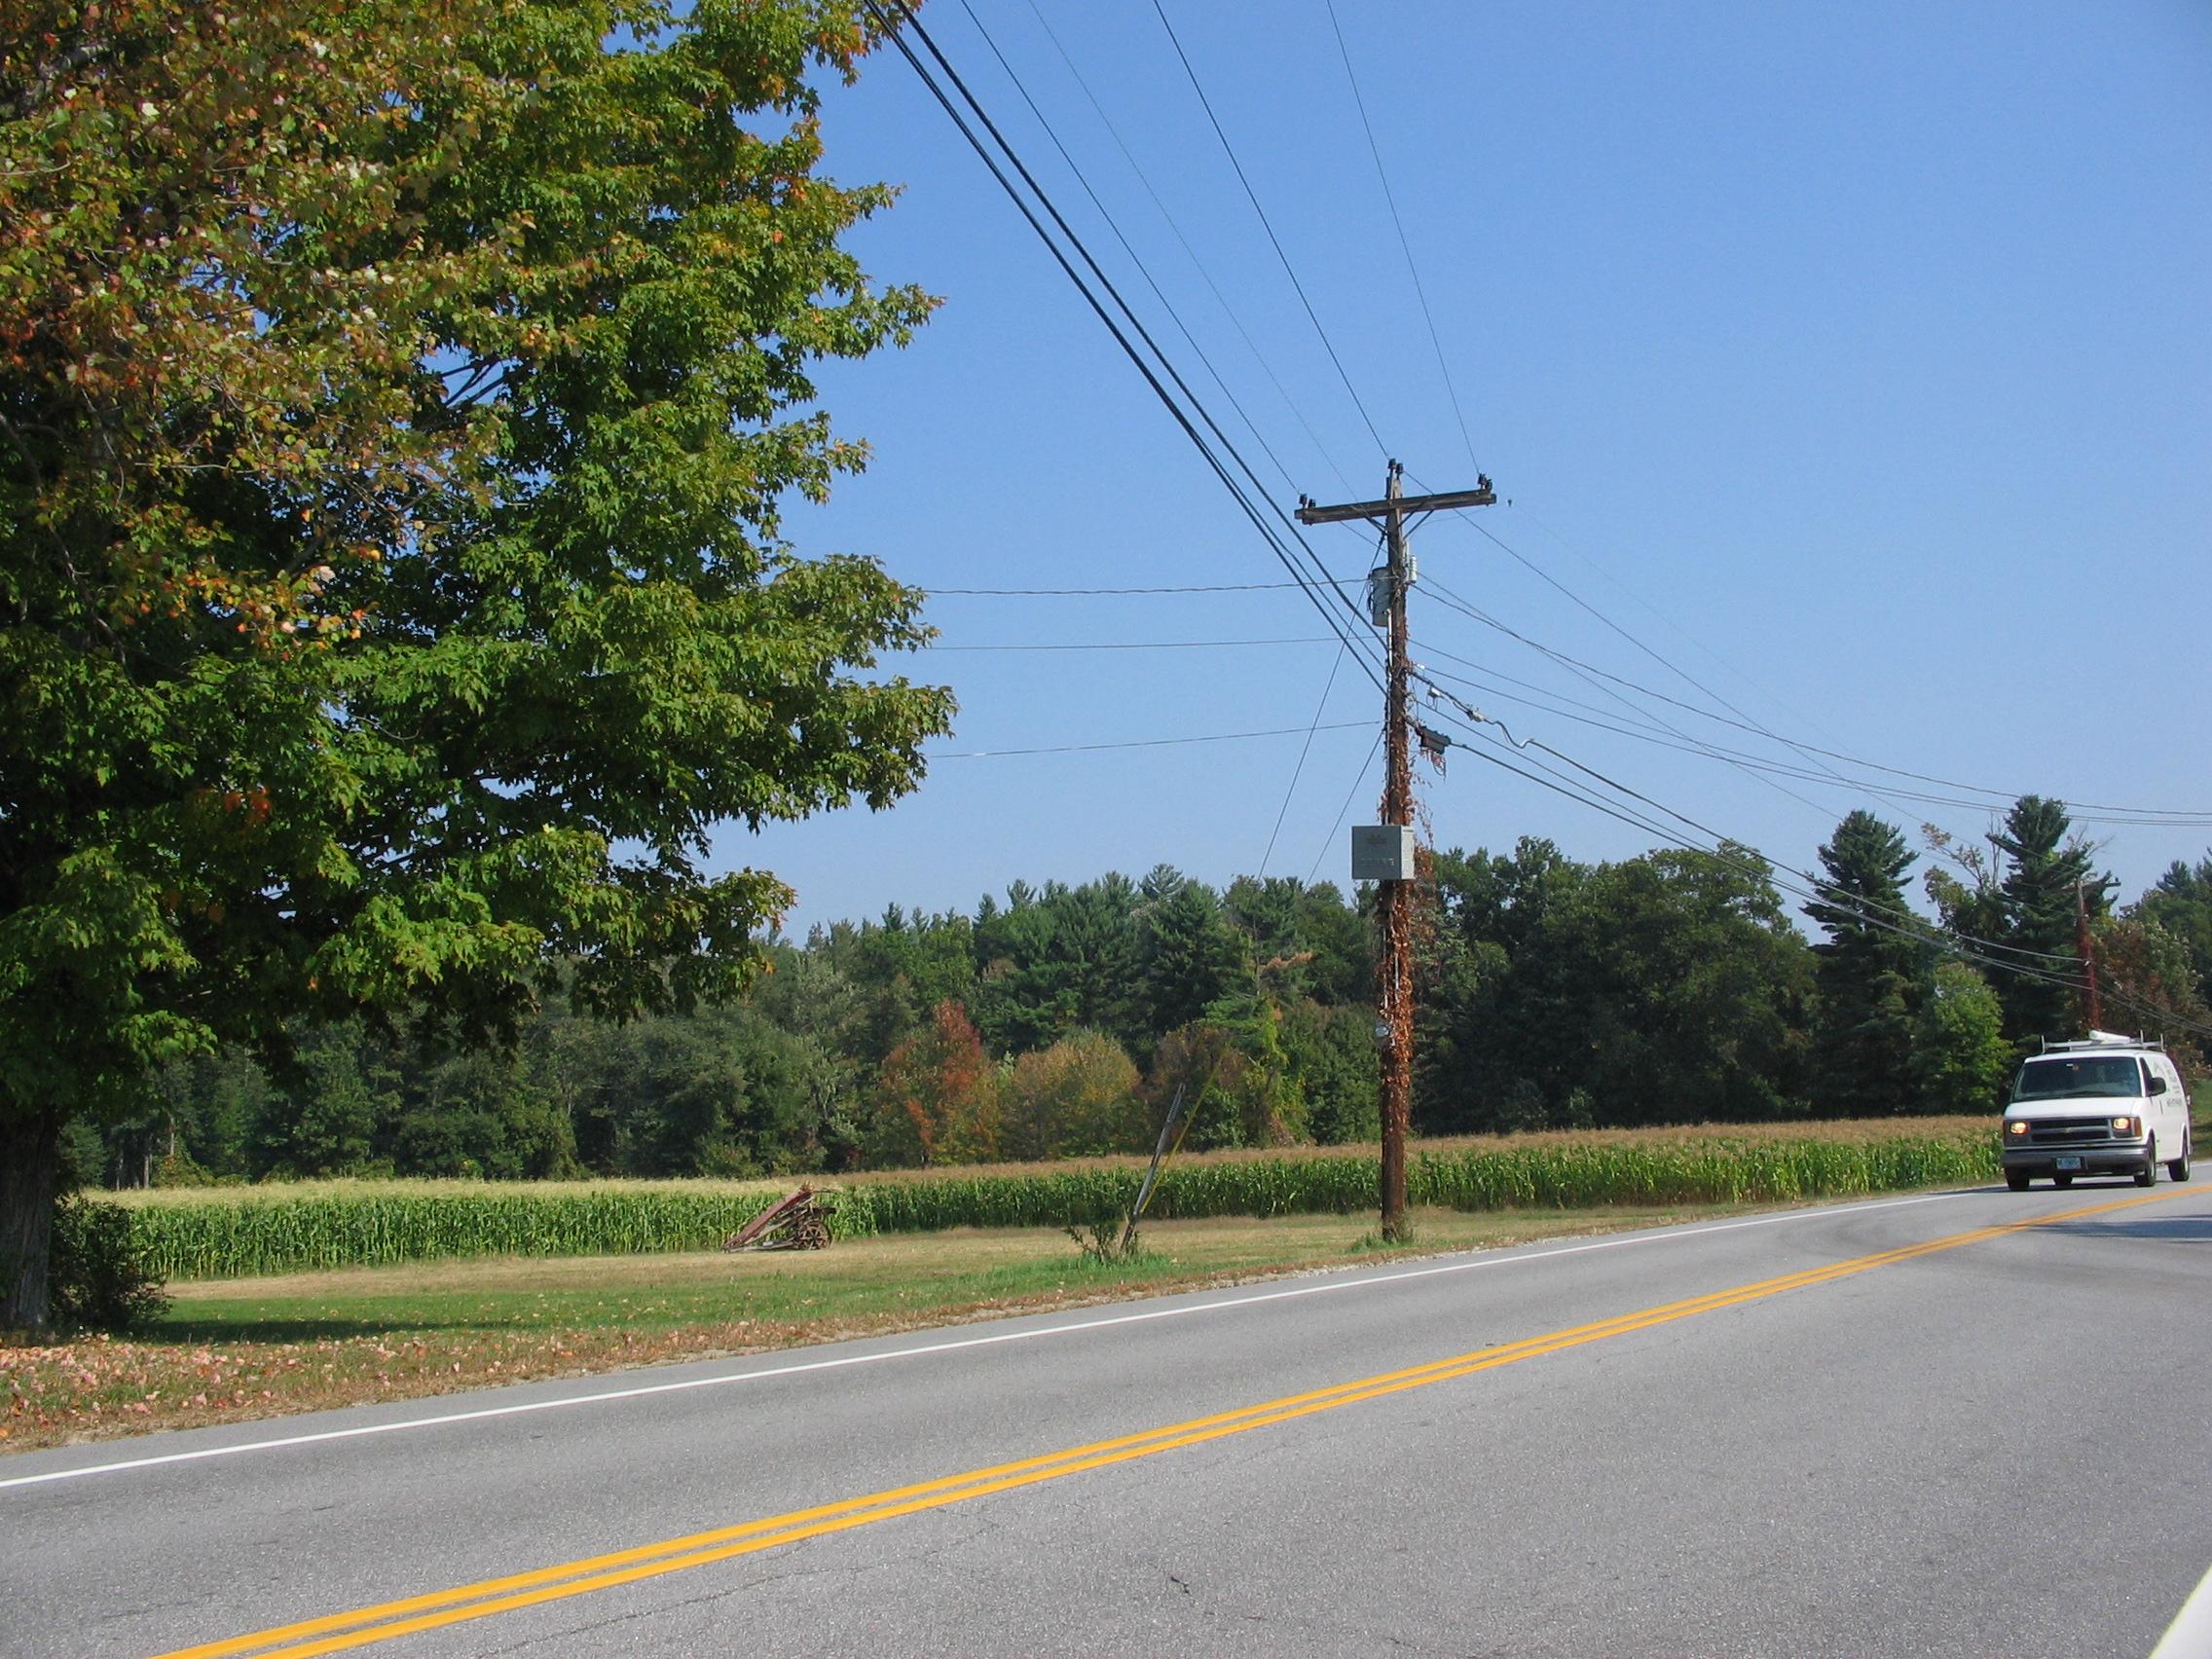 09-26-07 New Hampshire (2)